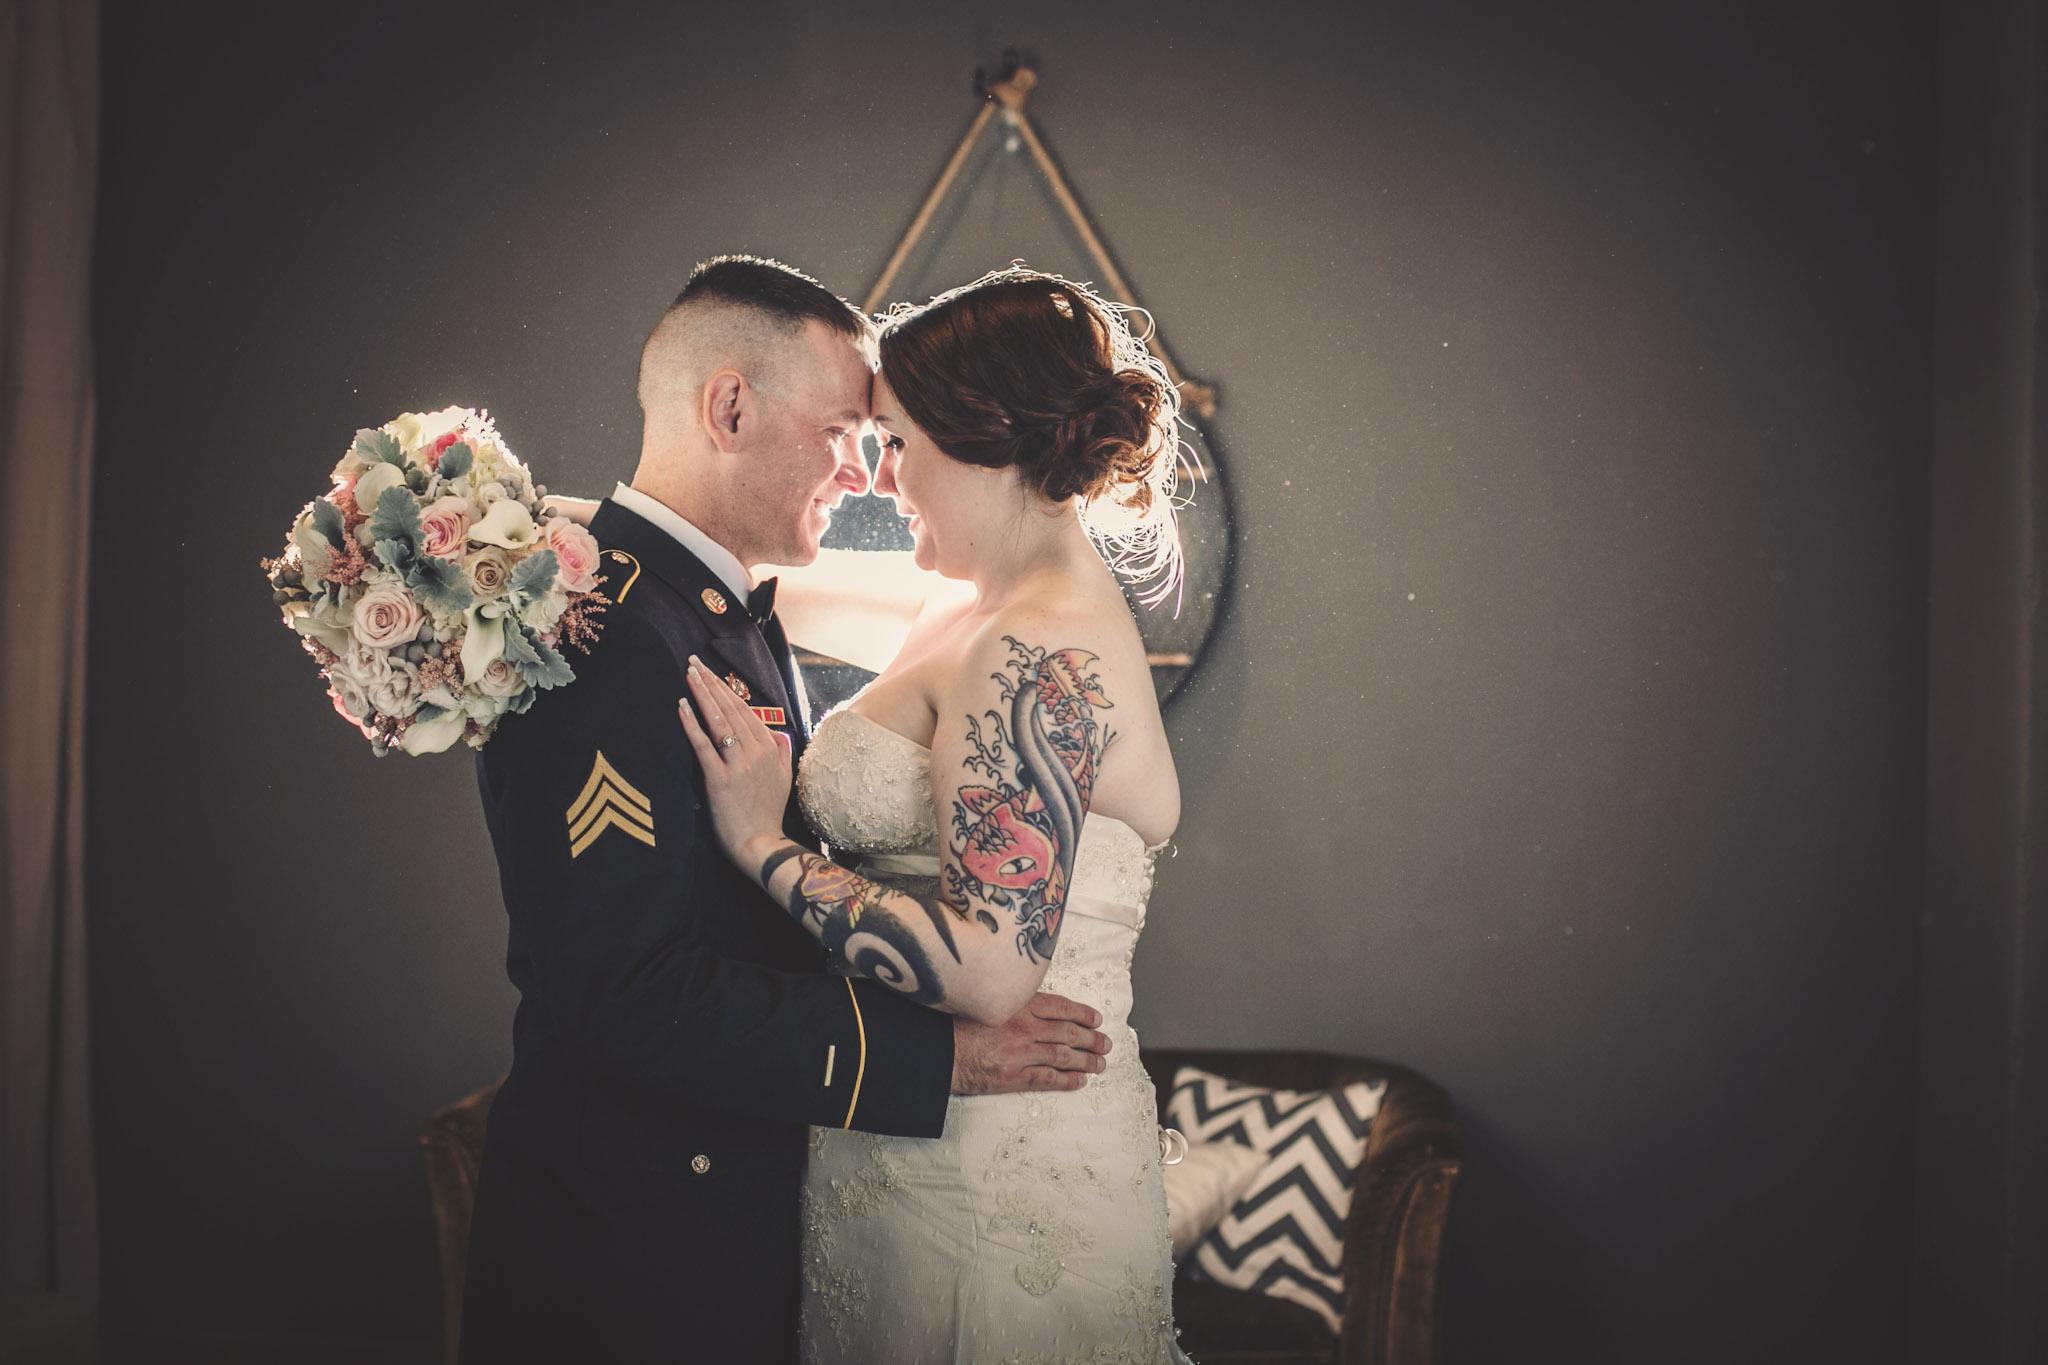 Kansas_City_Small_Wedding_Venue_Elope_Intimate_Ceremony_Budget_Affordable_Andrew&Sydney_284b.jpg